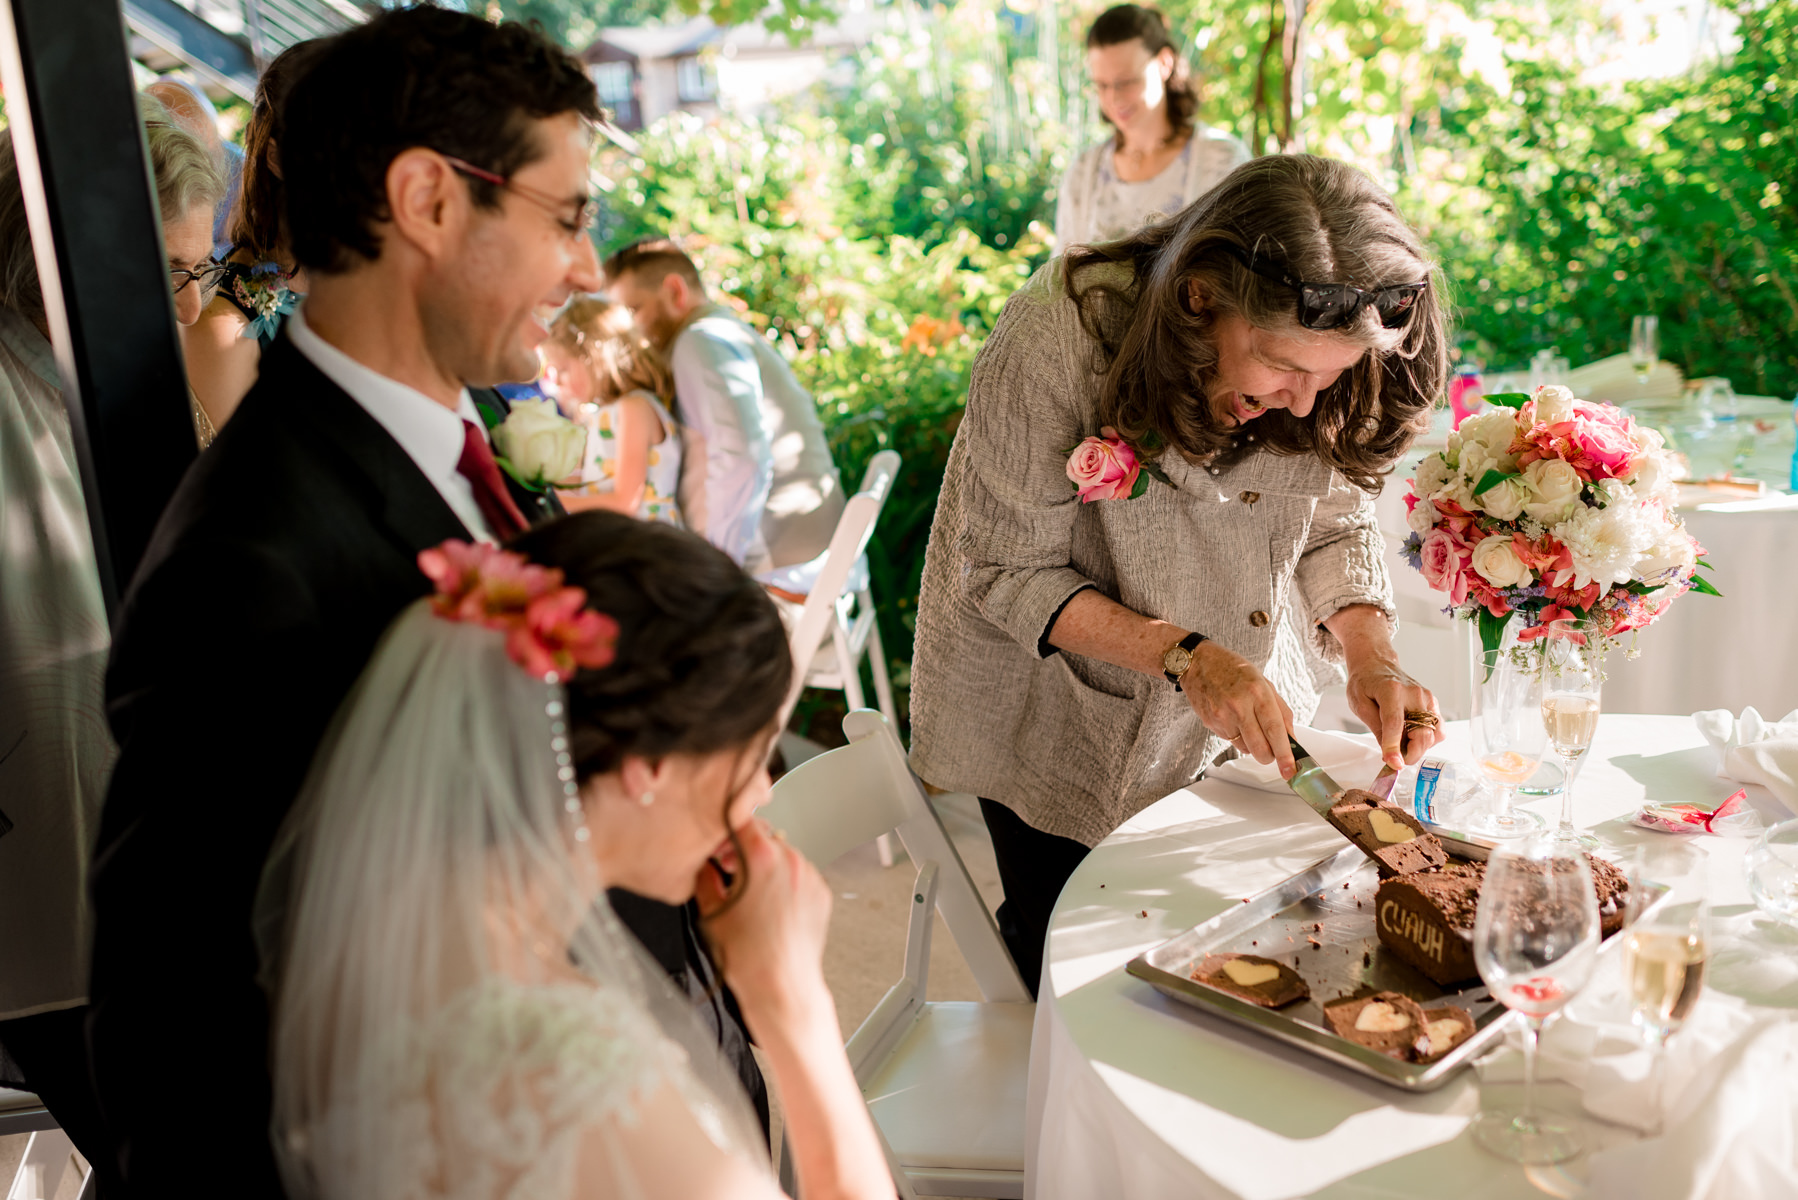 Andrew Tat - Documentary Wedding Photography - Kirkland, Washington - Emily & Cuauh - 36.JPG